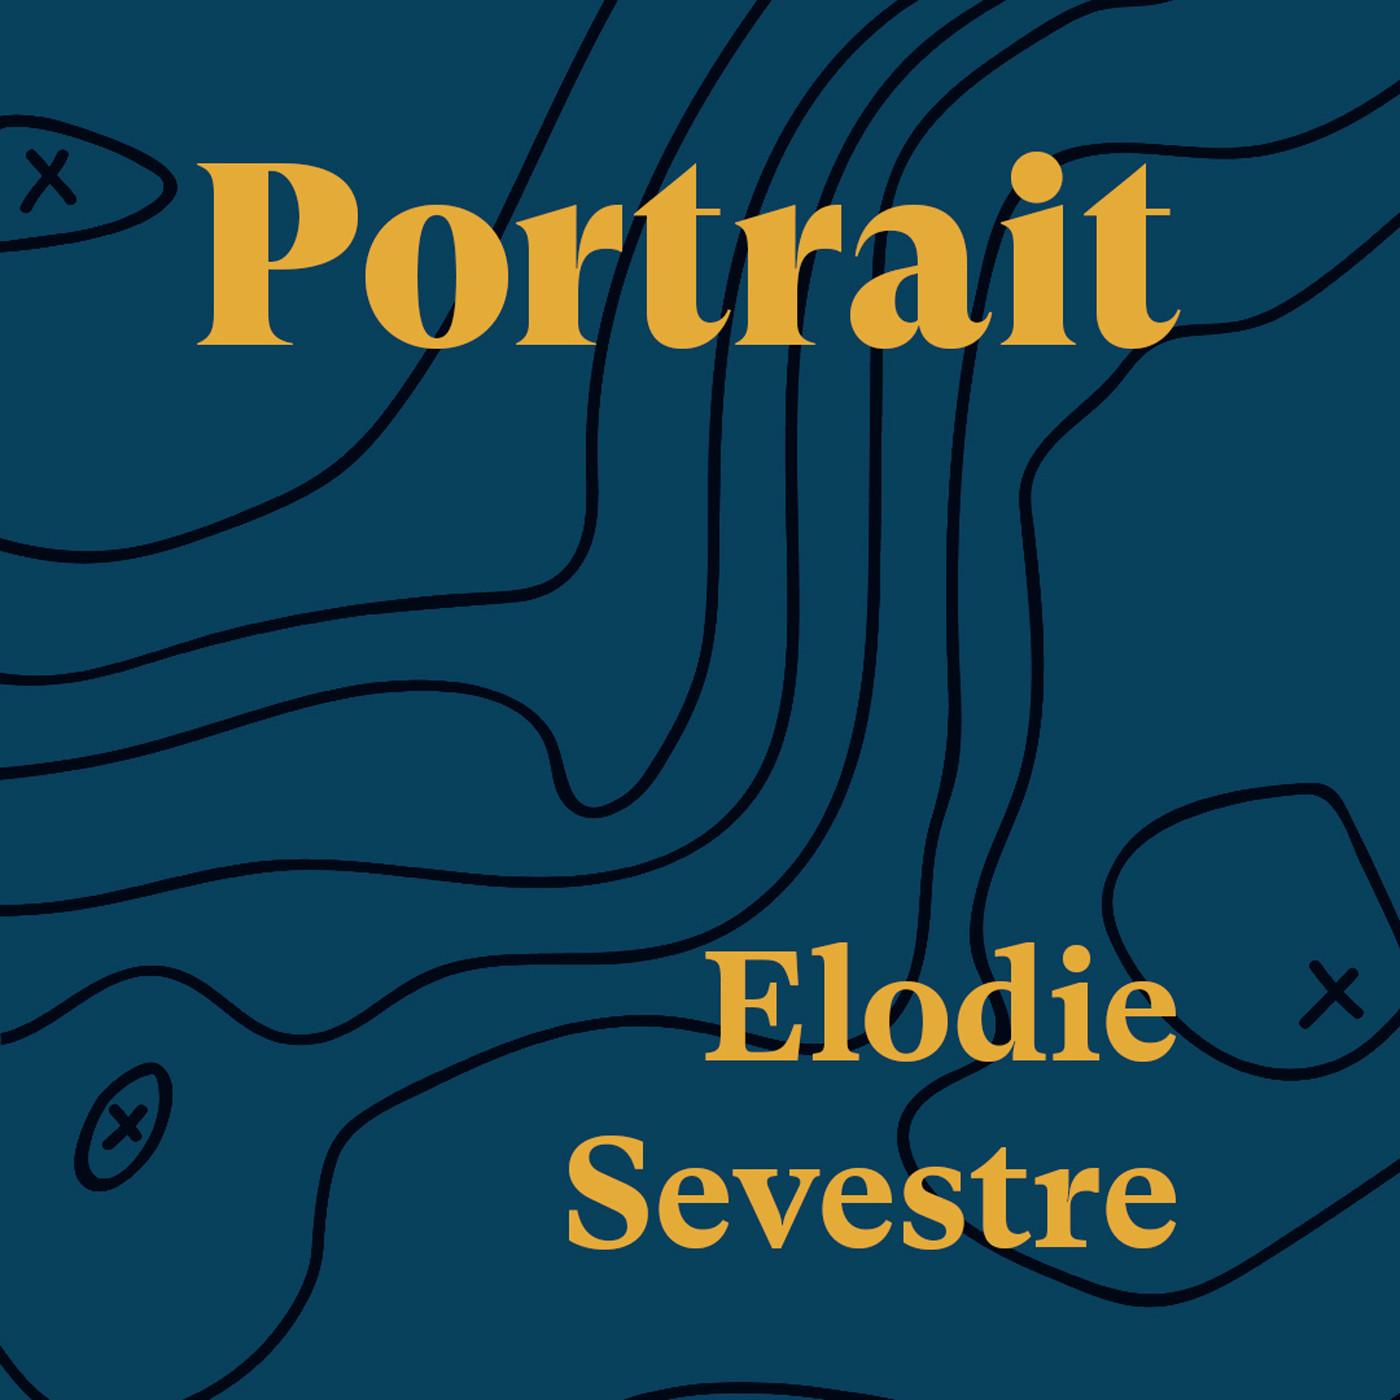 Portrait Elodie Sevestre